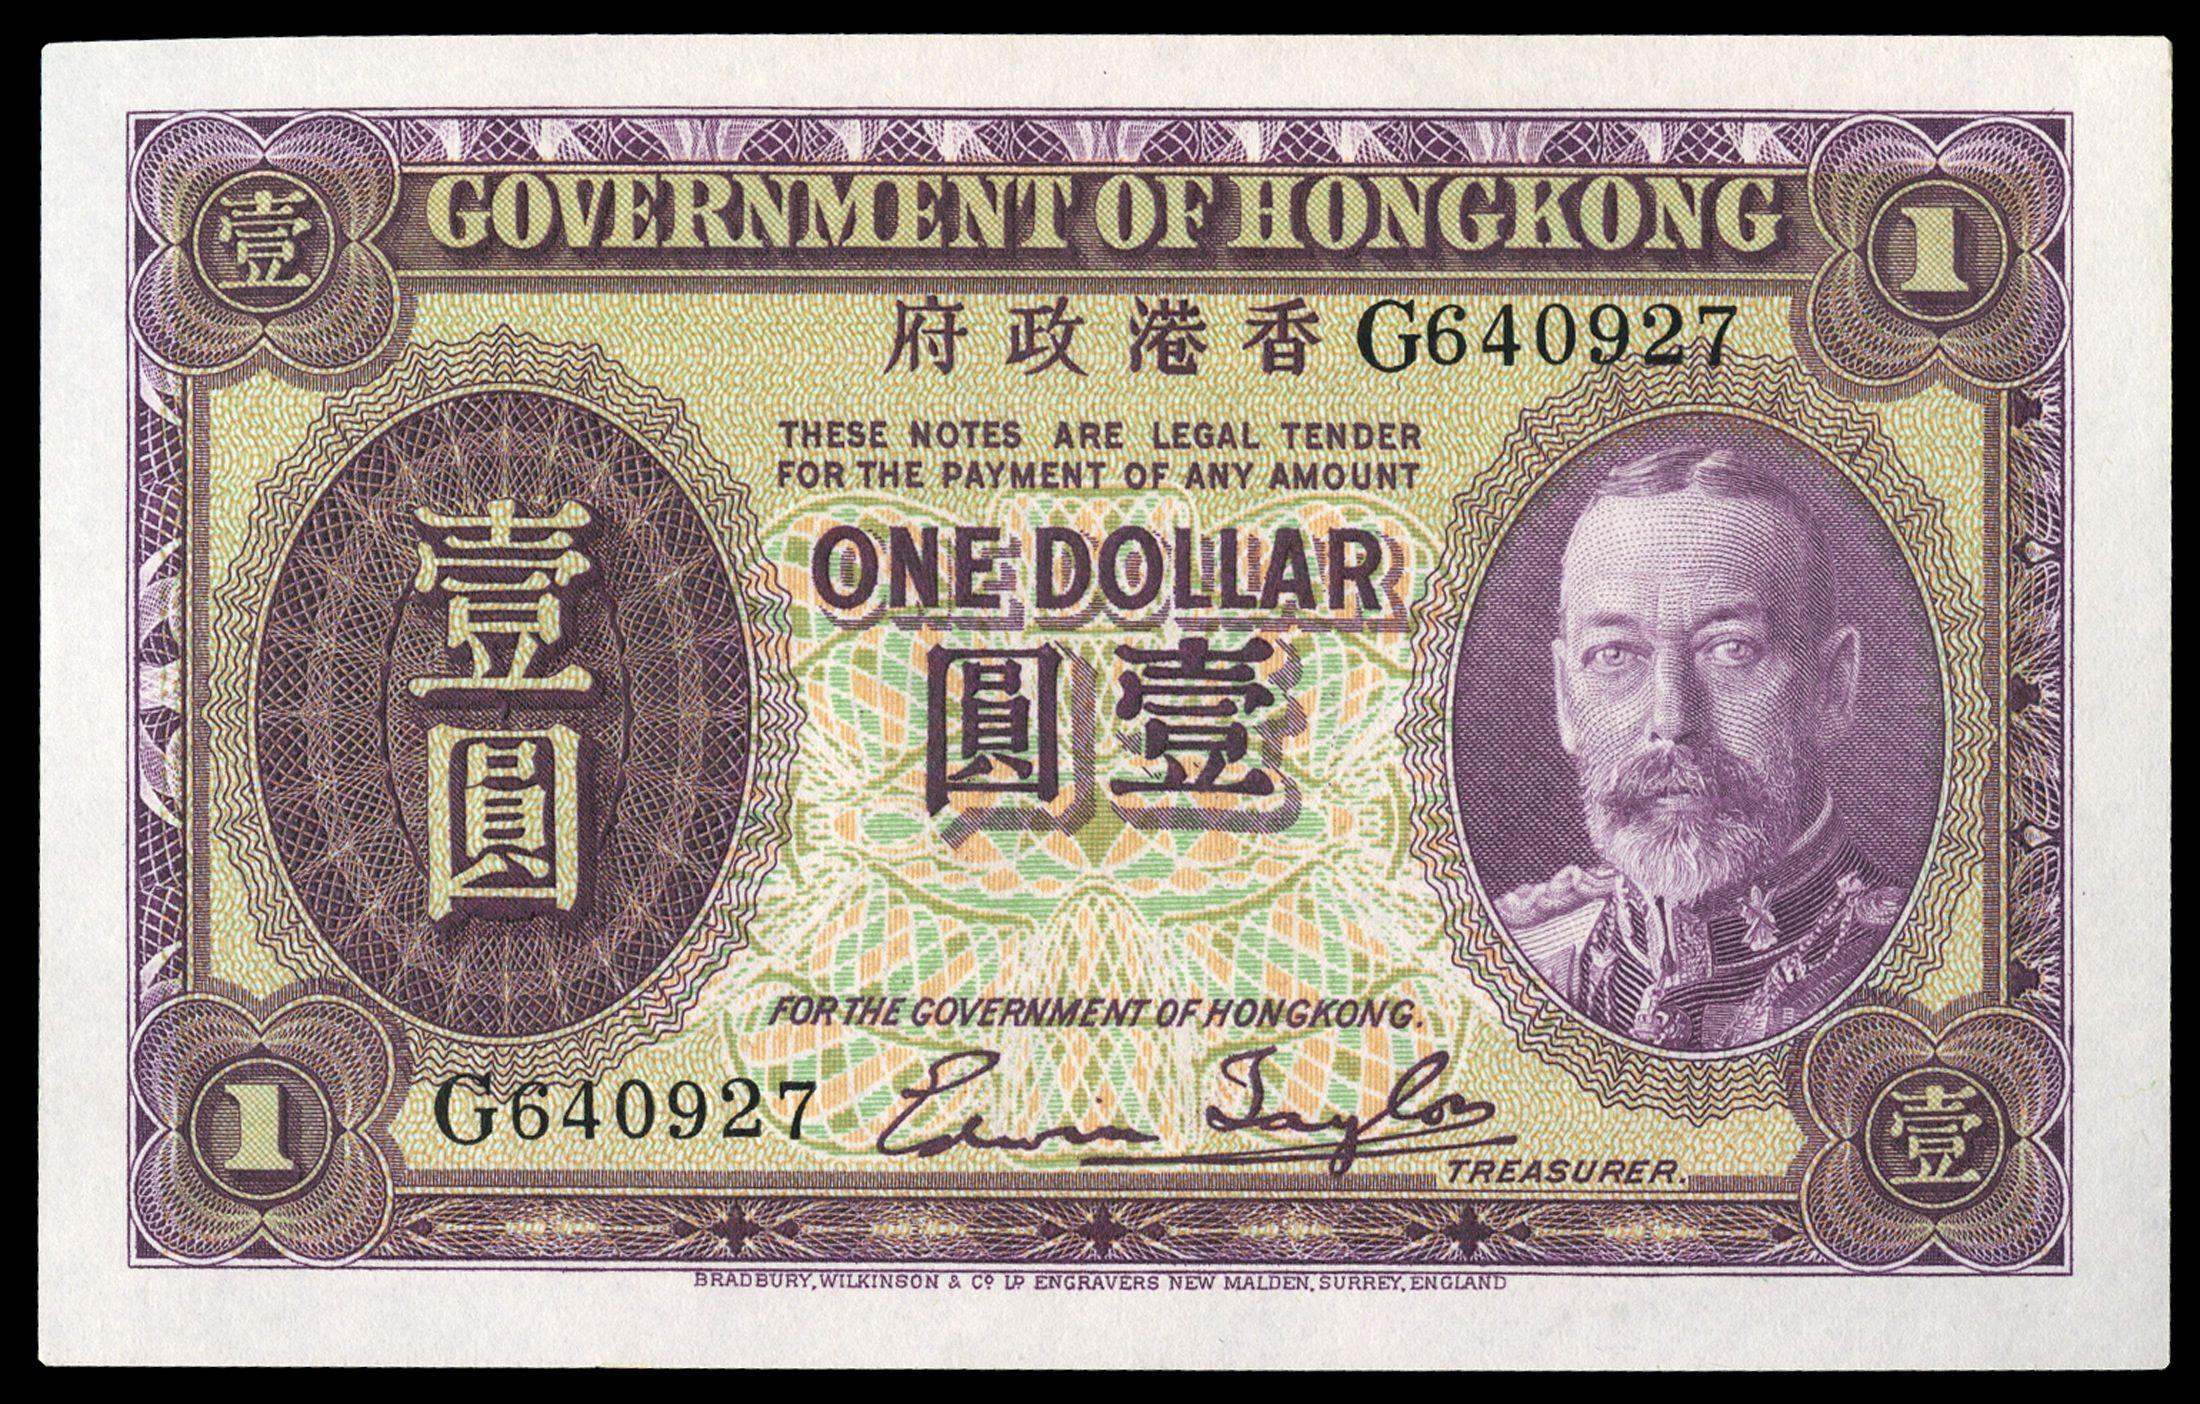 Hong Kong Government One Dollar G